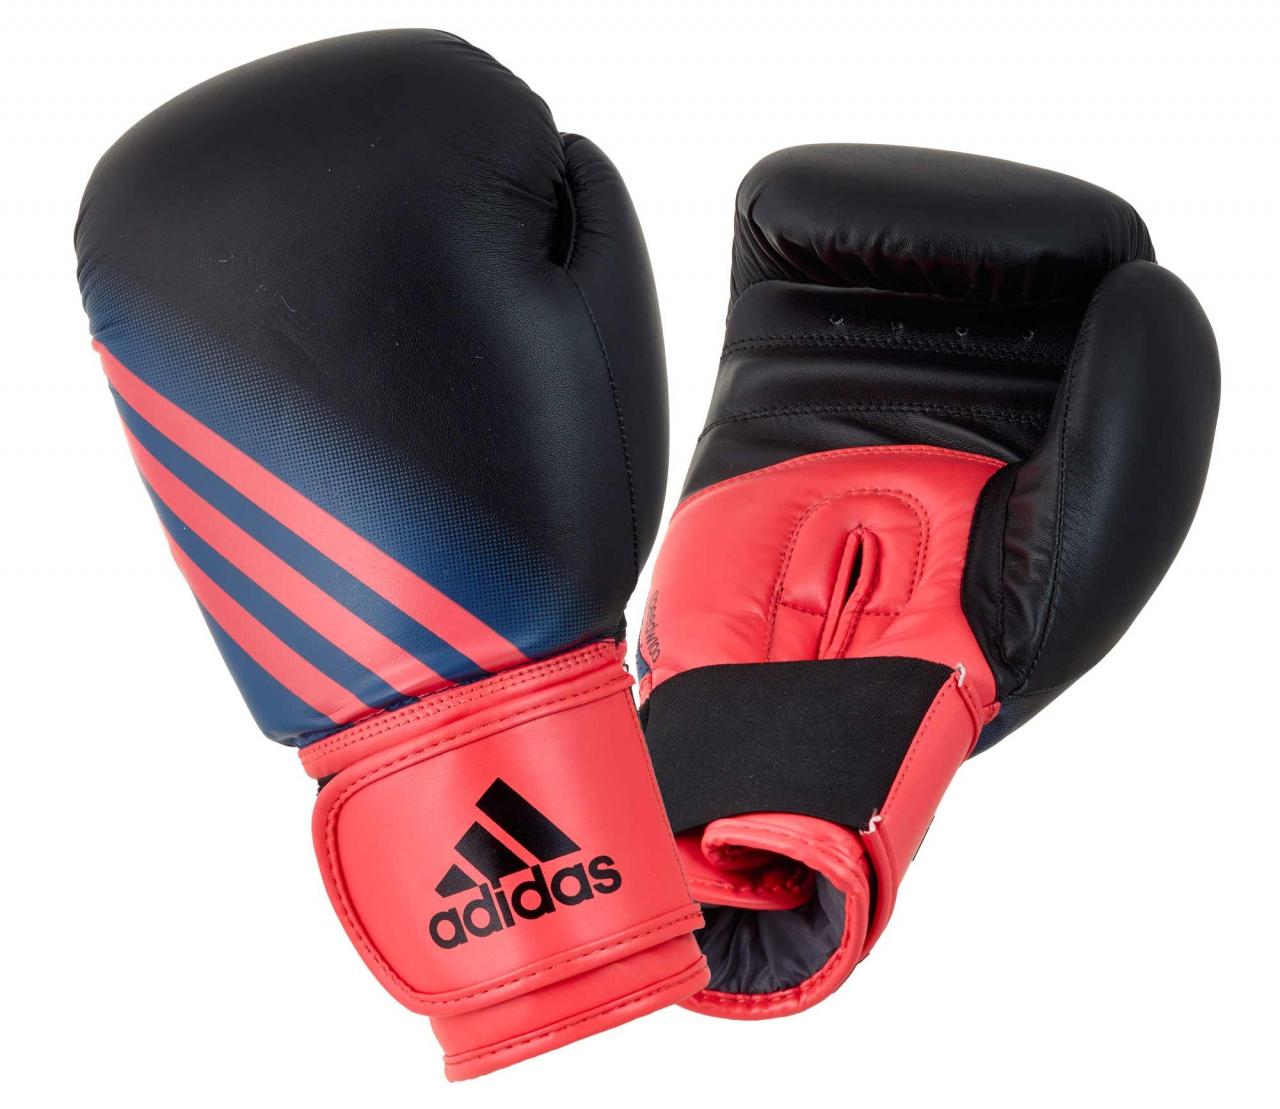 Adidas Speed 100 Boxhandschuhe in schwarz/shock rot